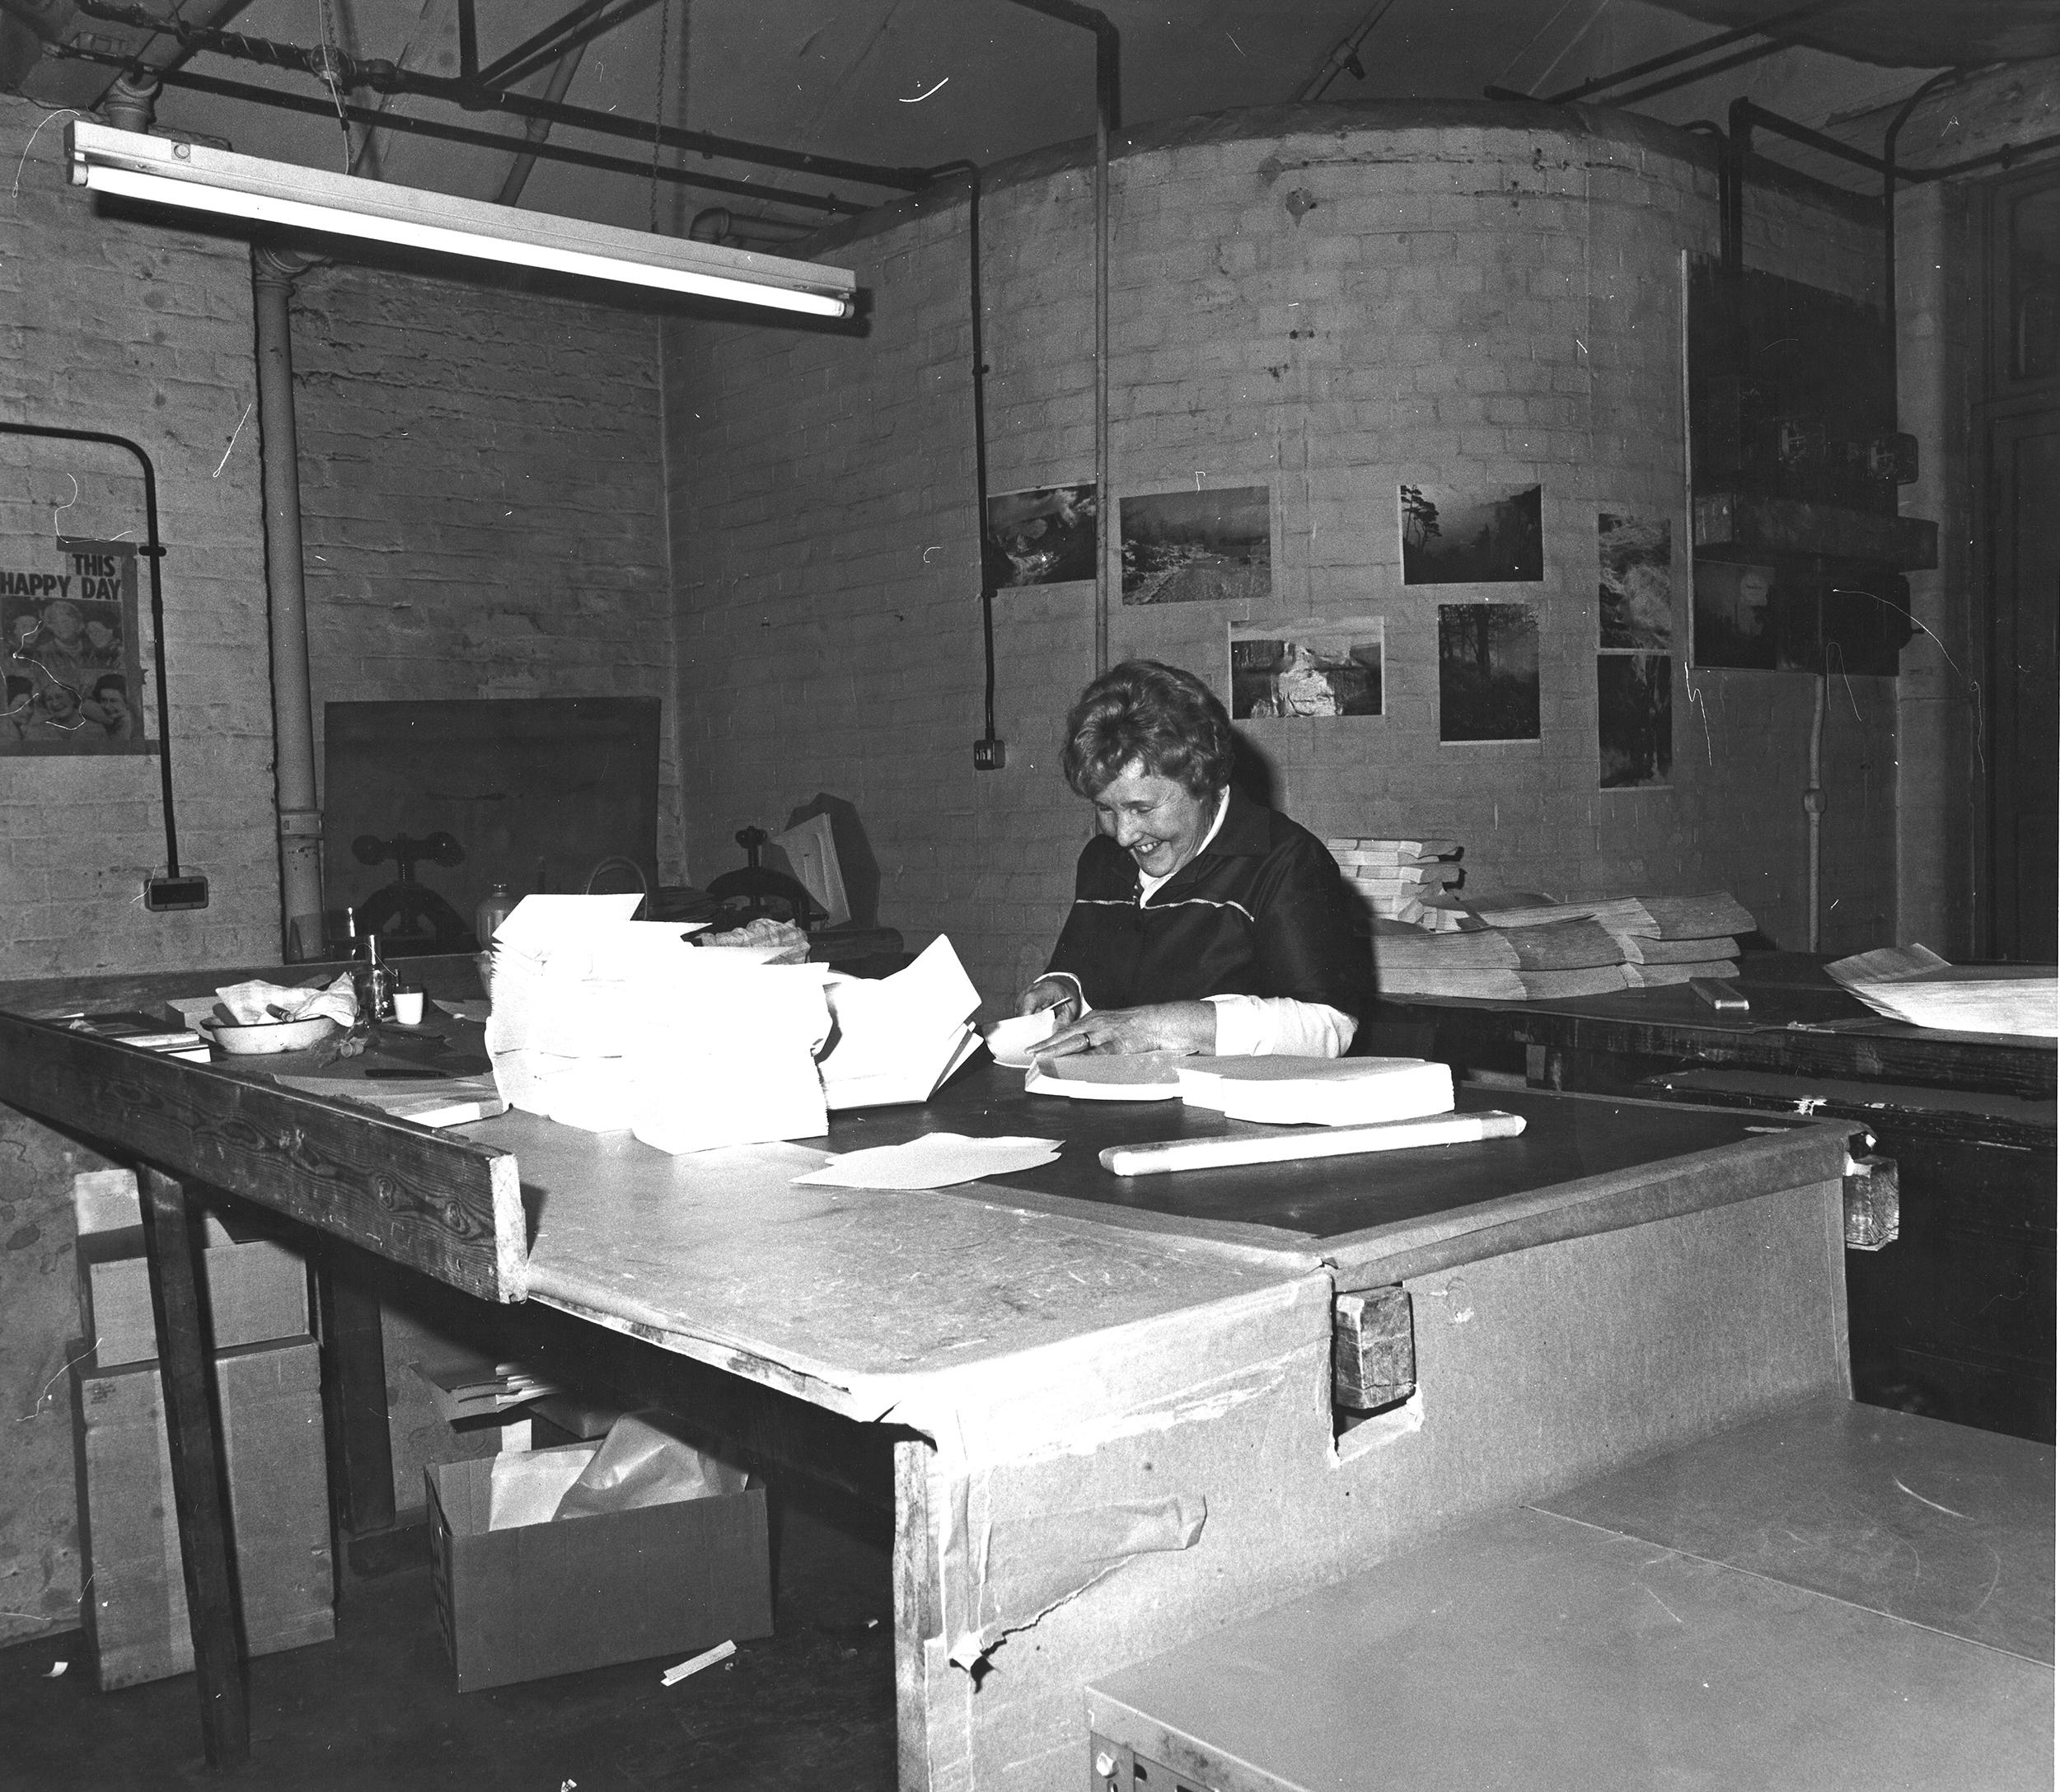 Woman making envelopes at desk